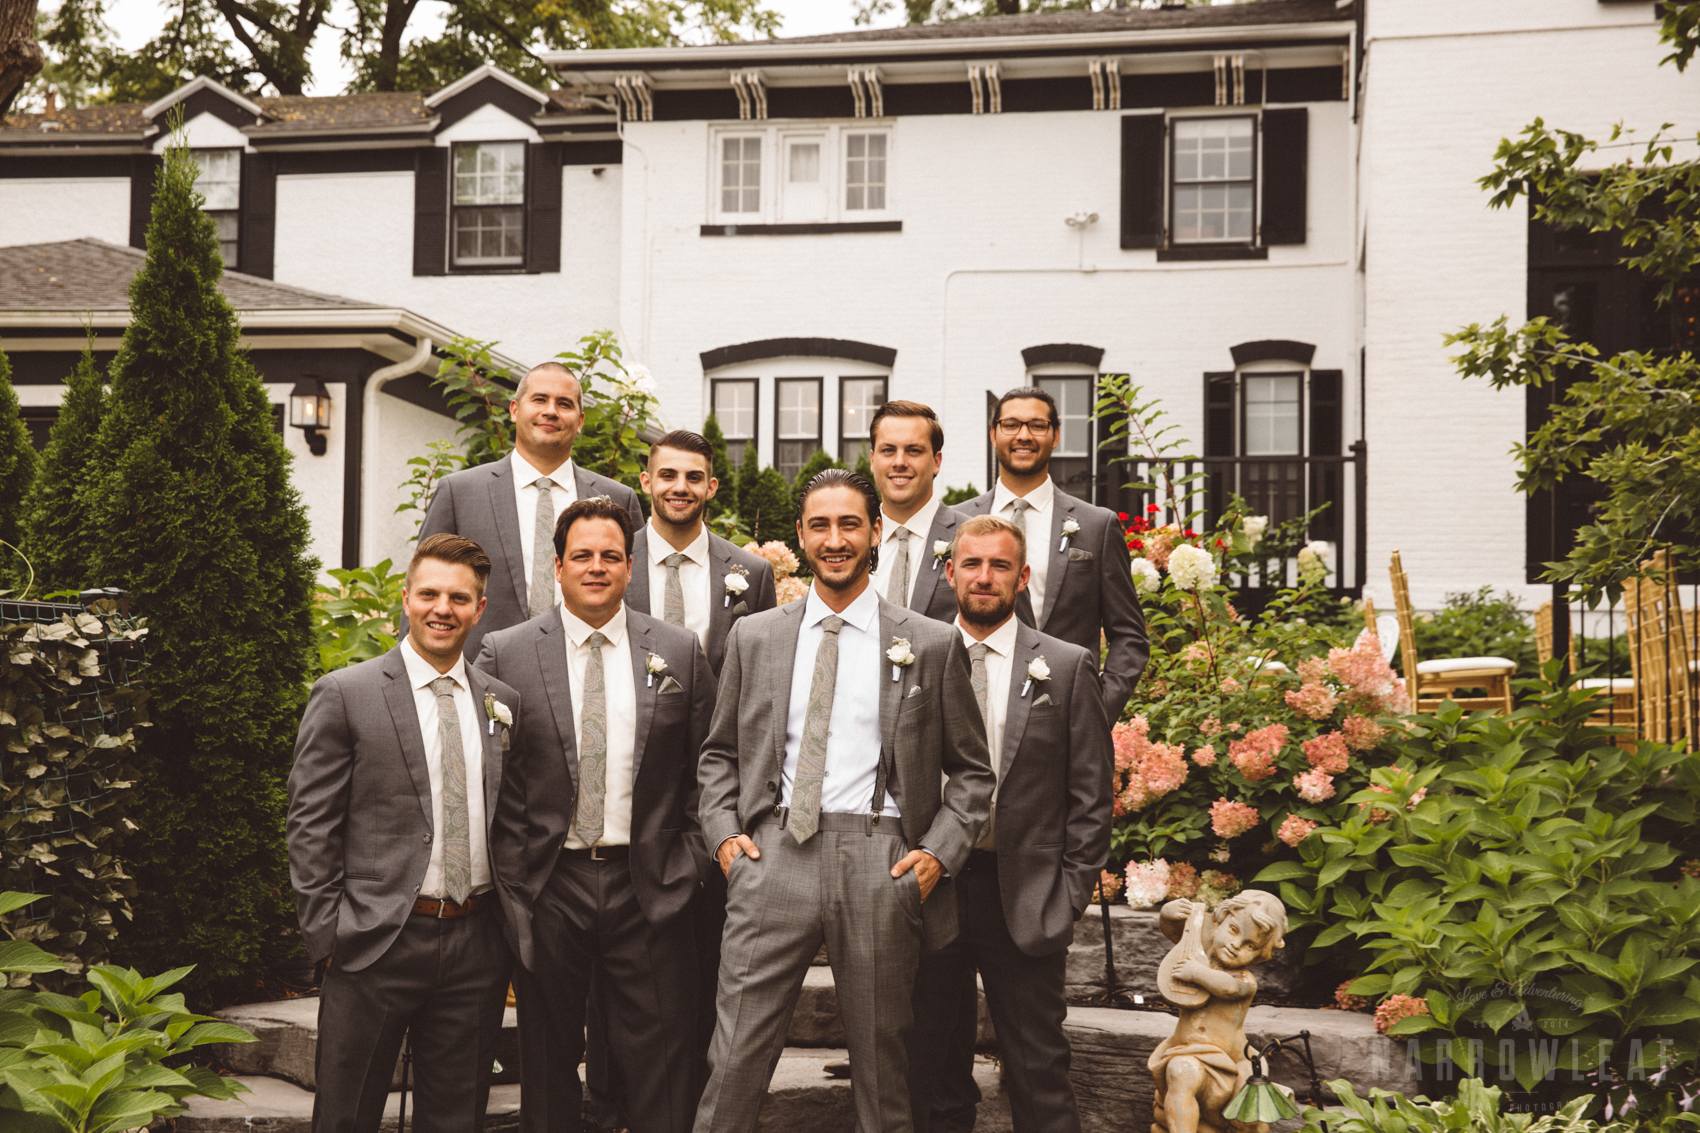 Lake-Geneva-WI-Wedding-bridal-party-formals-3607.jpg